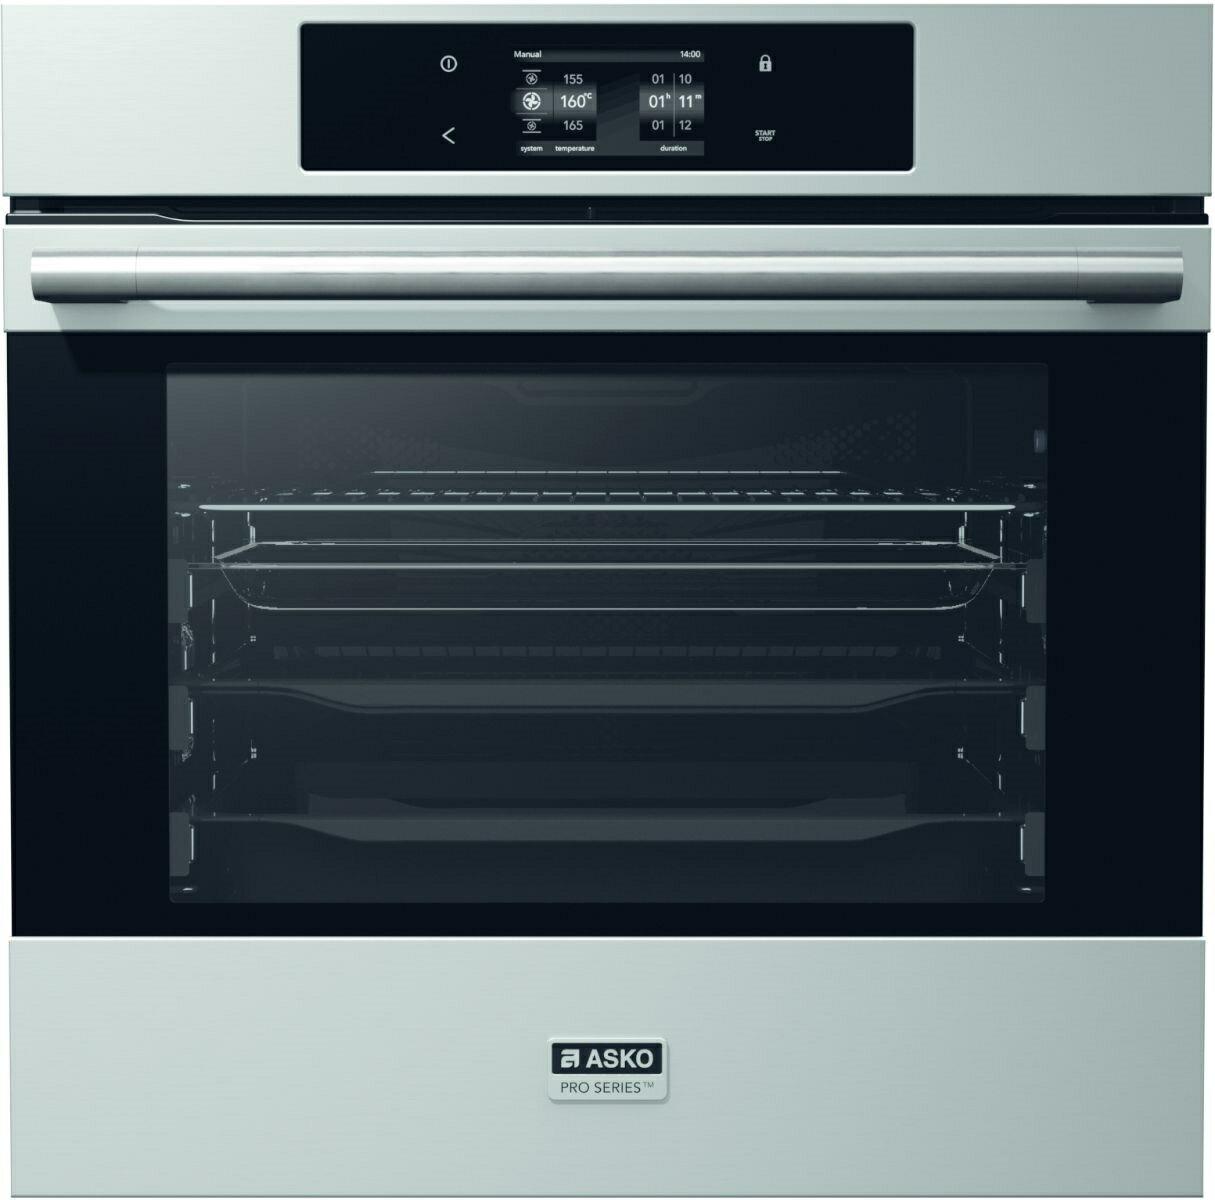 ASKO 瑞典賽寧 OP8676S 嵌入式熱解烤箱【零利率】 ※熱線07-7428010